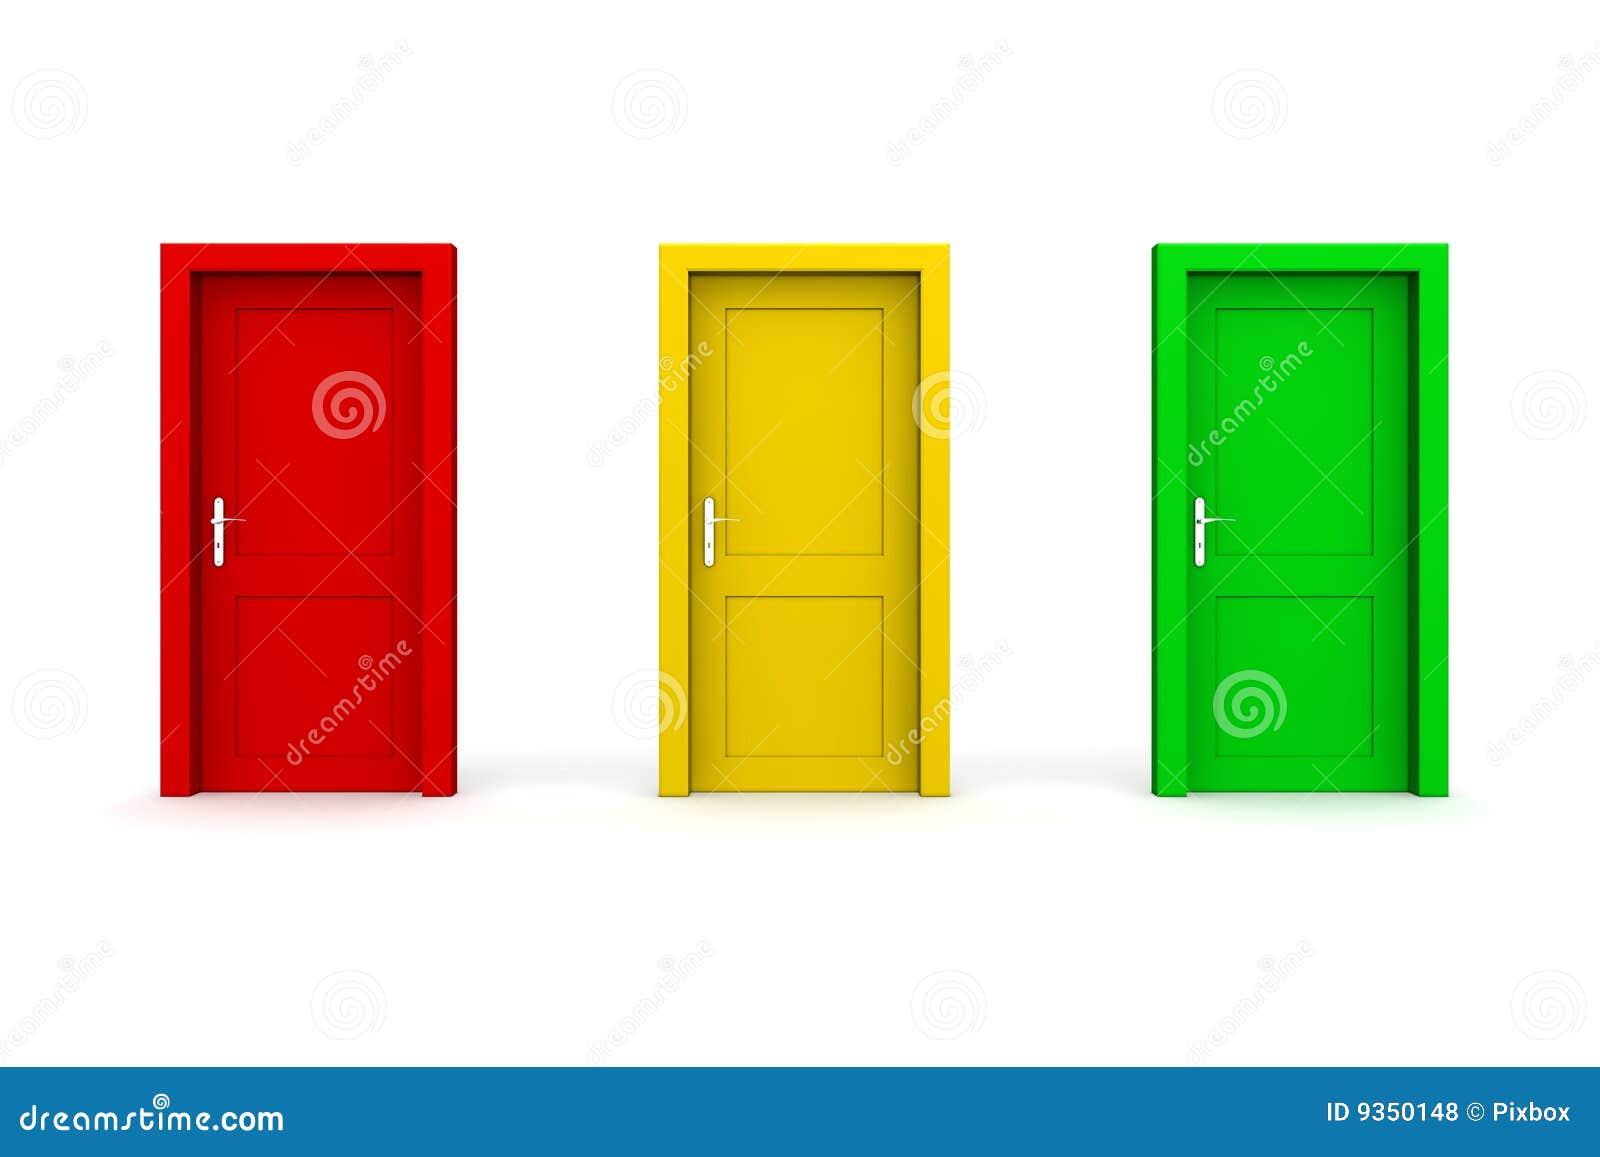 Three Coloured Doors - Red Yellow Green  sc 1 st  Dreamstime.com & Three Coloured Doors - Red Yellow Green Stock Illustration ...